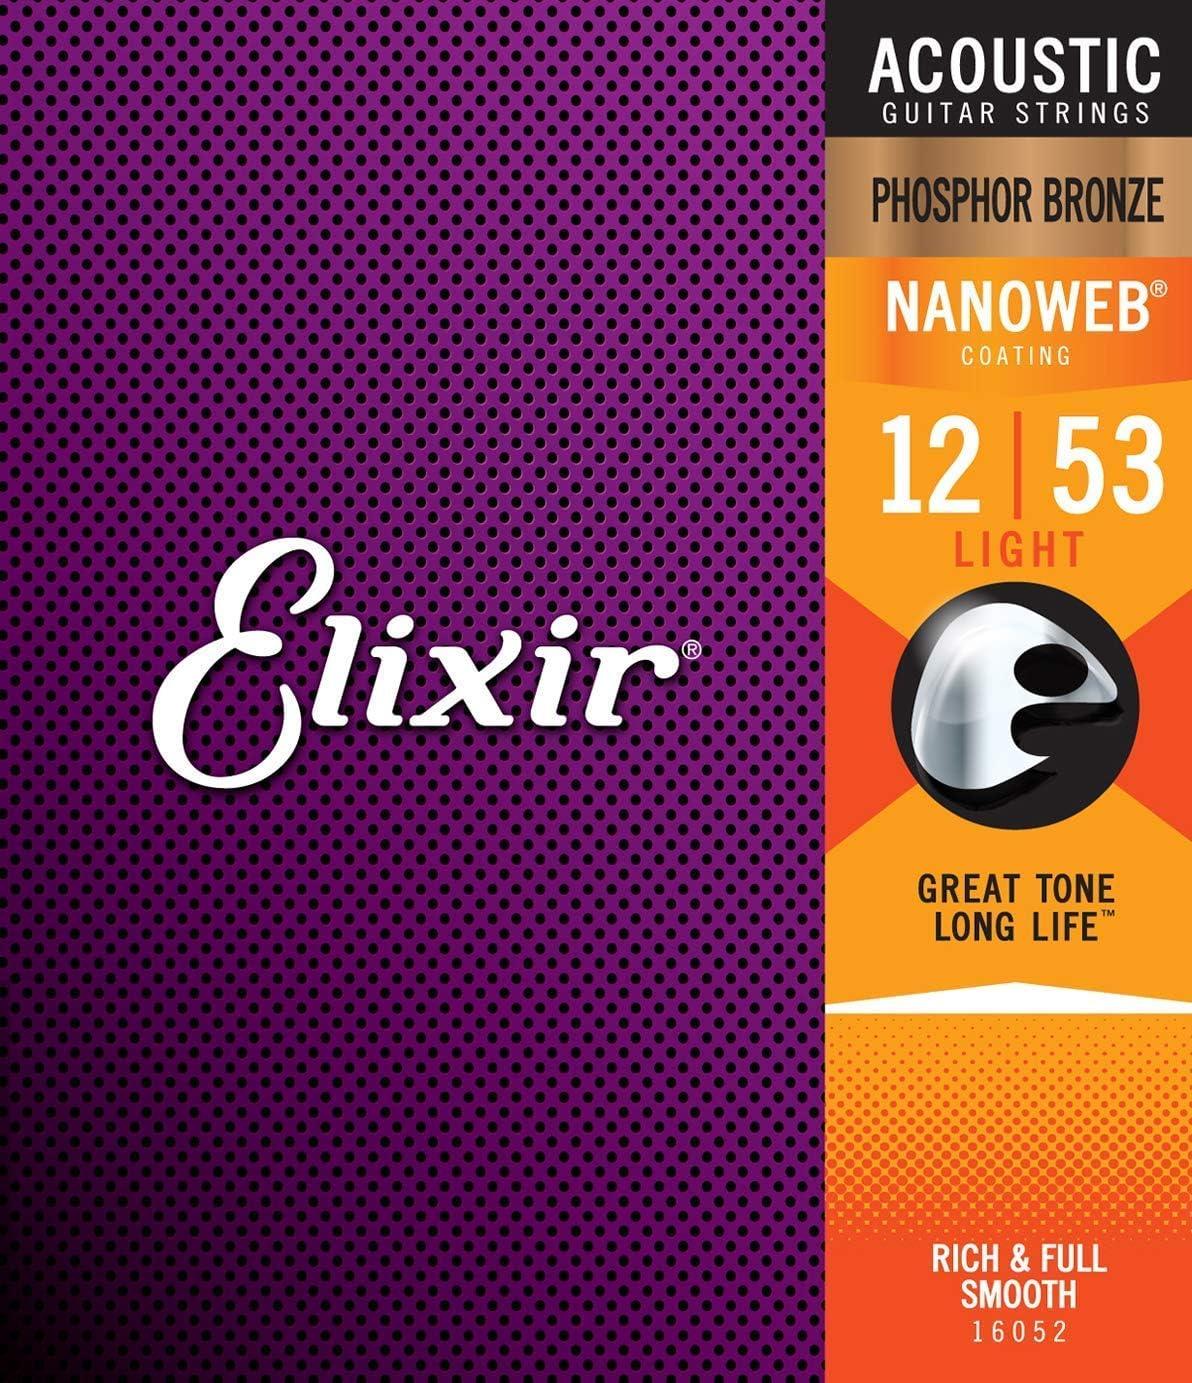 Suitable for Elixir Saiten Phosphor Bronze Akustik-Gitarrensaiten mit NANOWEB® Beschichtung, Light (.012-.053